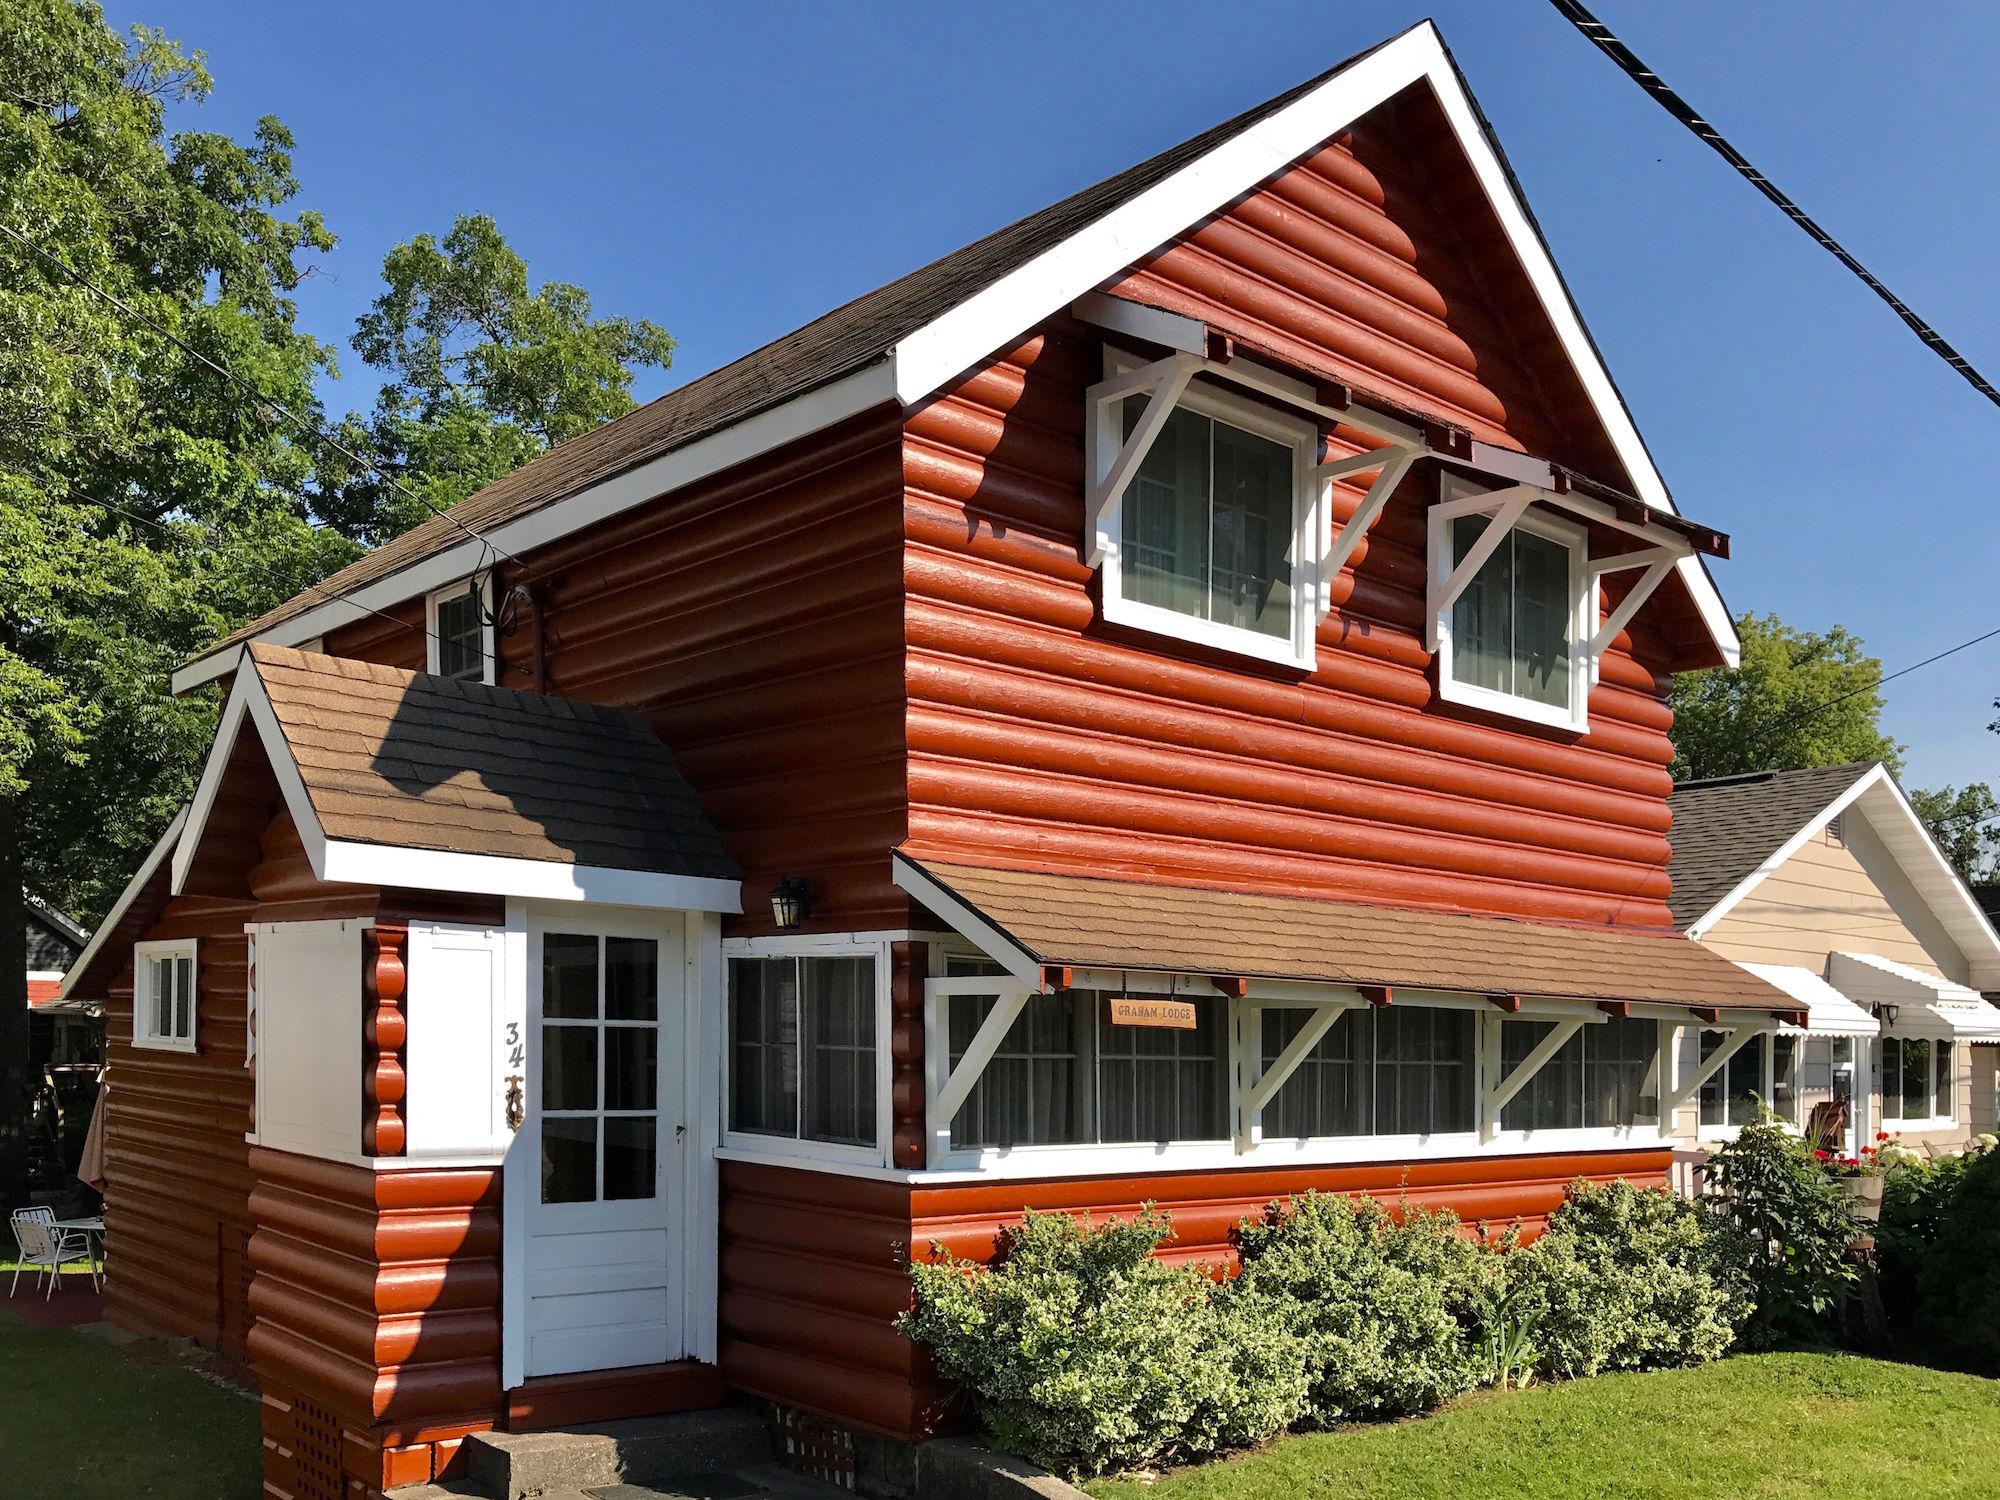 34 Huron St., Grand Bend - Cottages for Rent